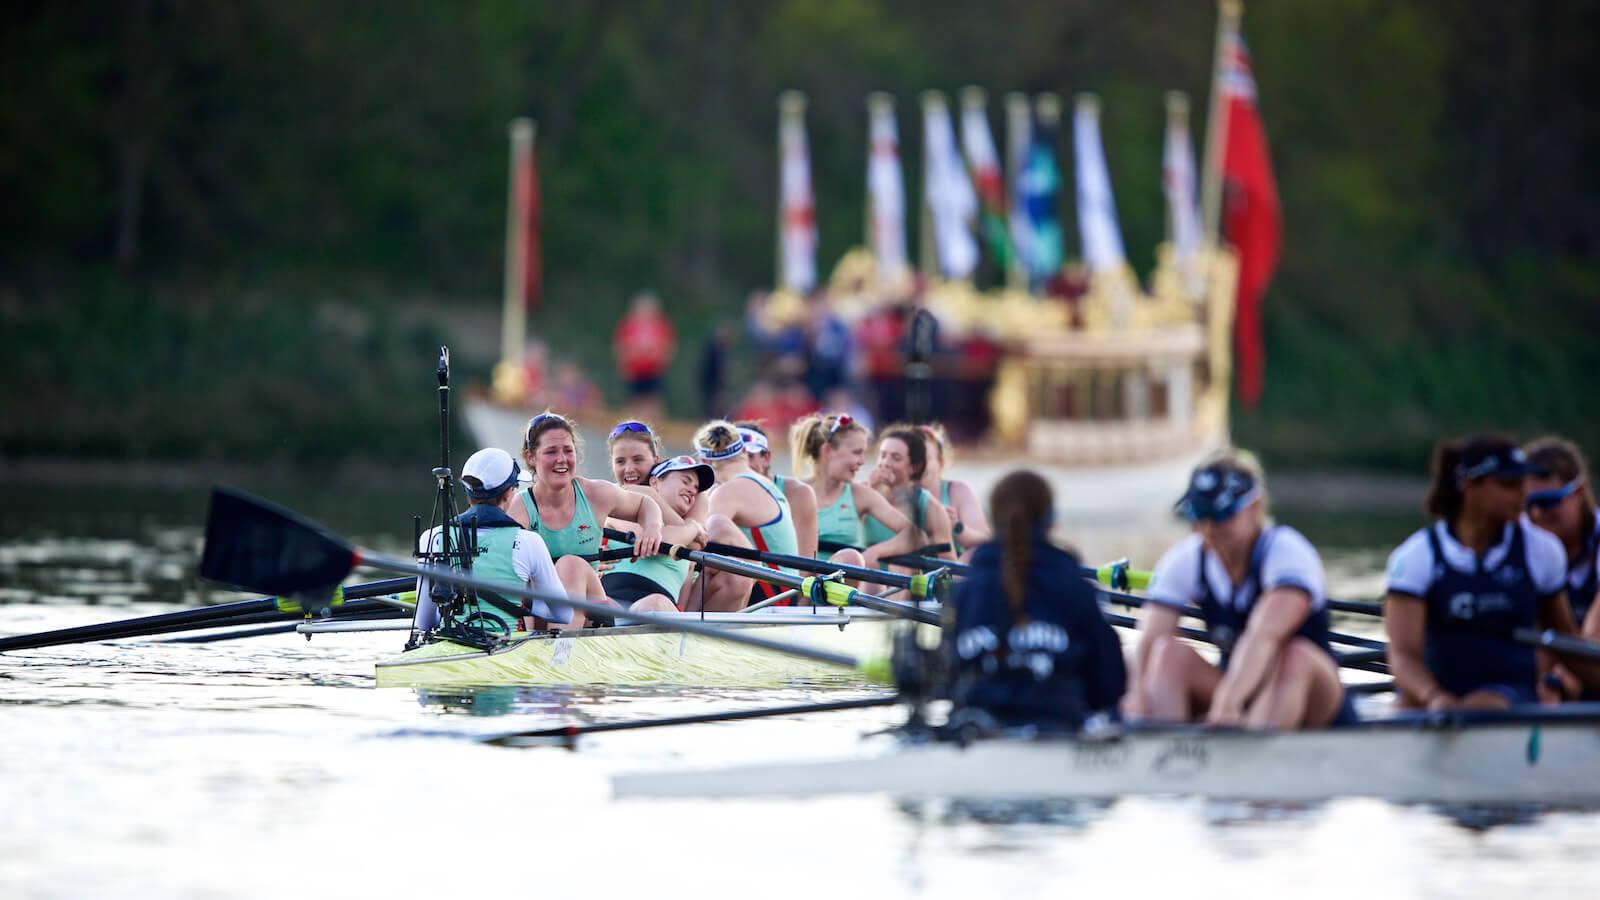 boat race - oxford and cambridge university - boat race between oxford and cambridge university